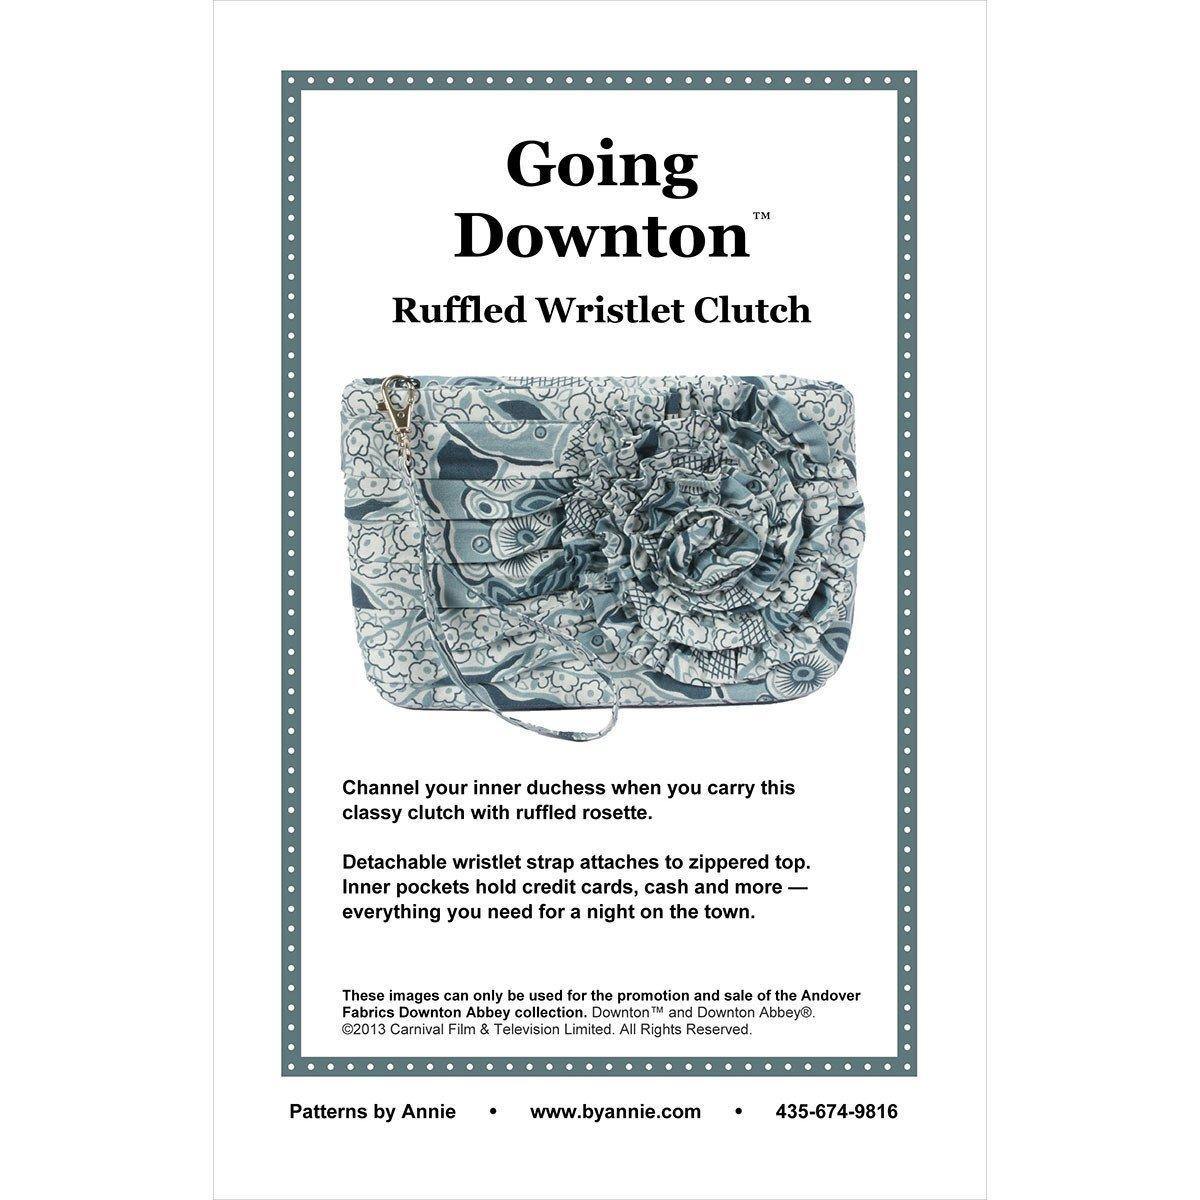 Going Downtown Ruffled Wristlet Clutch Pattern